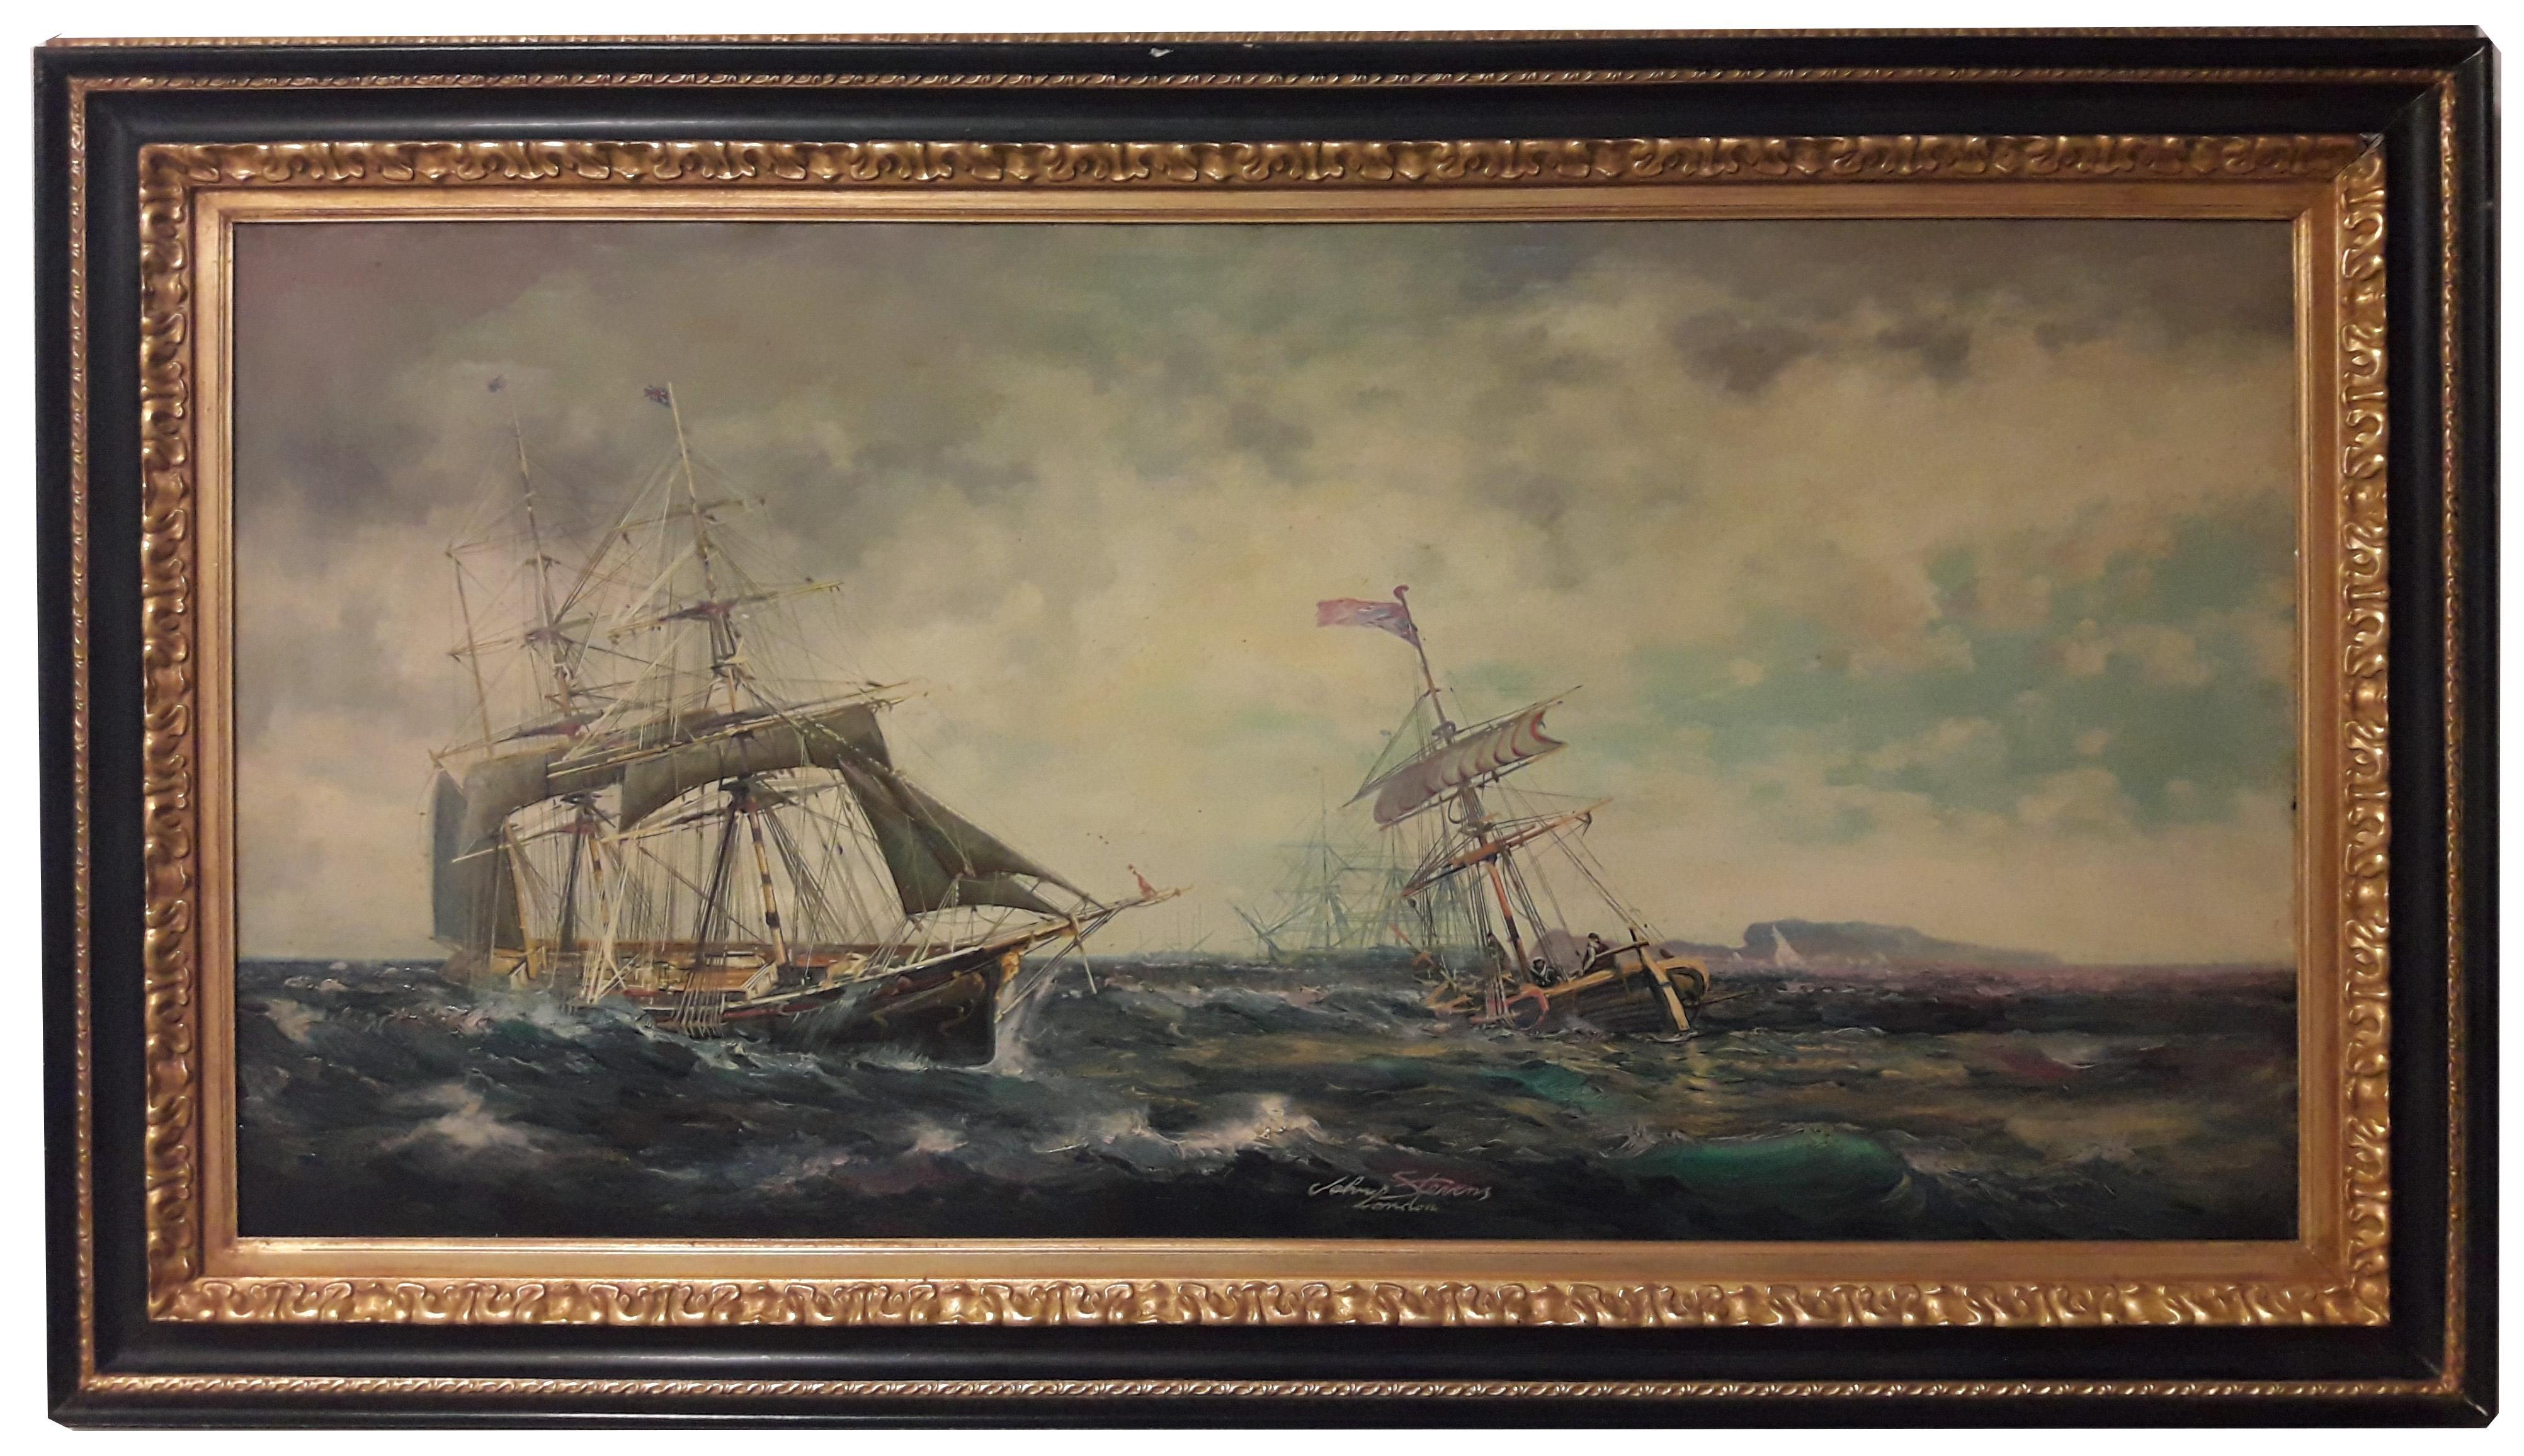 SAILING - English School -  Italian Sailing Boat Oil on canvas Painting